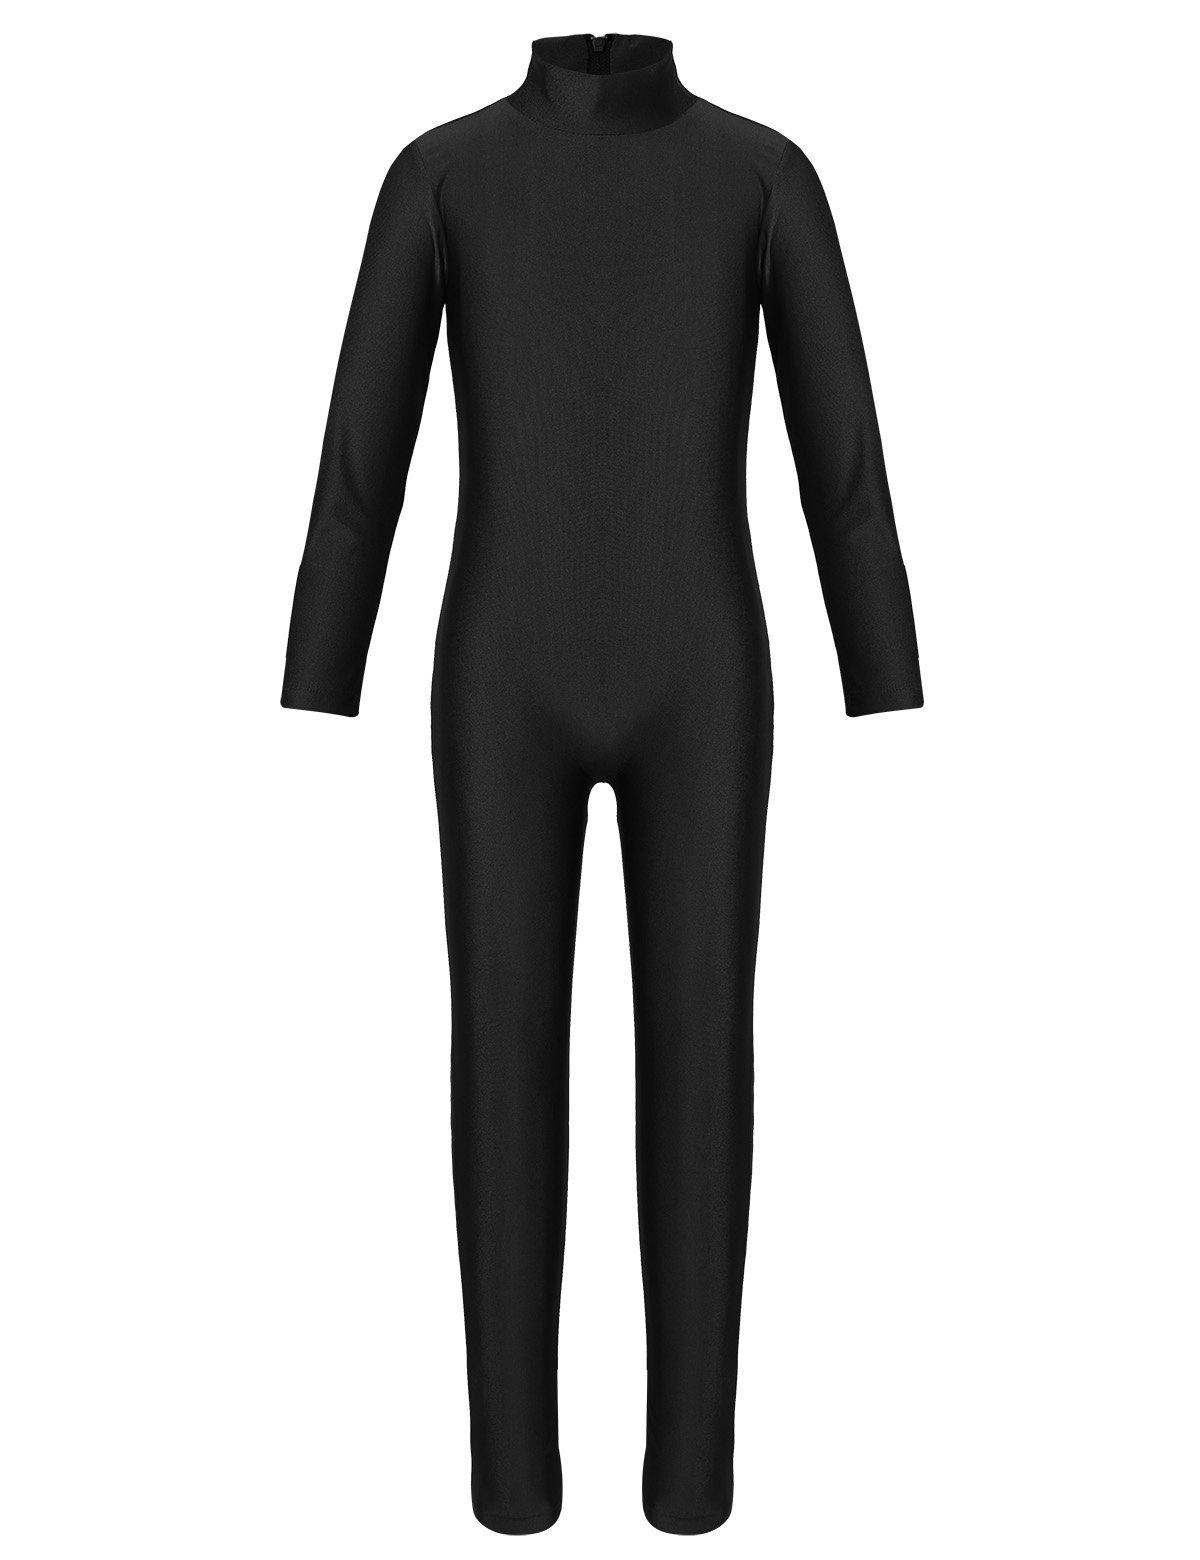 - 614HGzcHMzL - iiniim Kids Boys Girls Long Sleeve Unitard Jumpsuit Spandex Full Body Suit Costumes Gymnastics Leotard